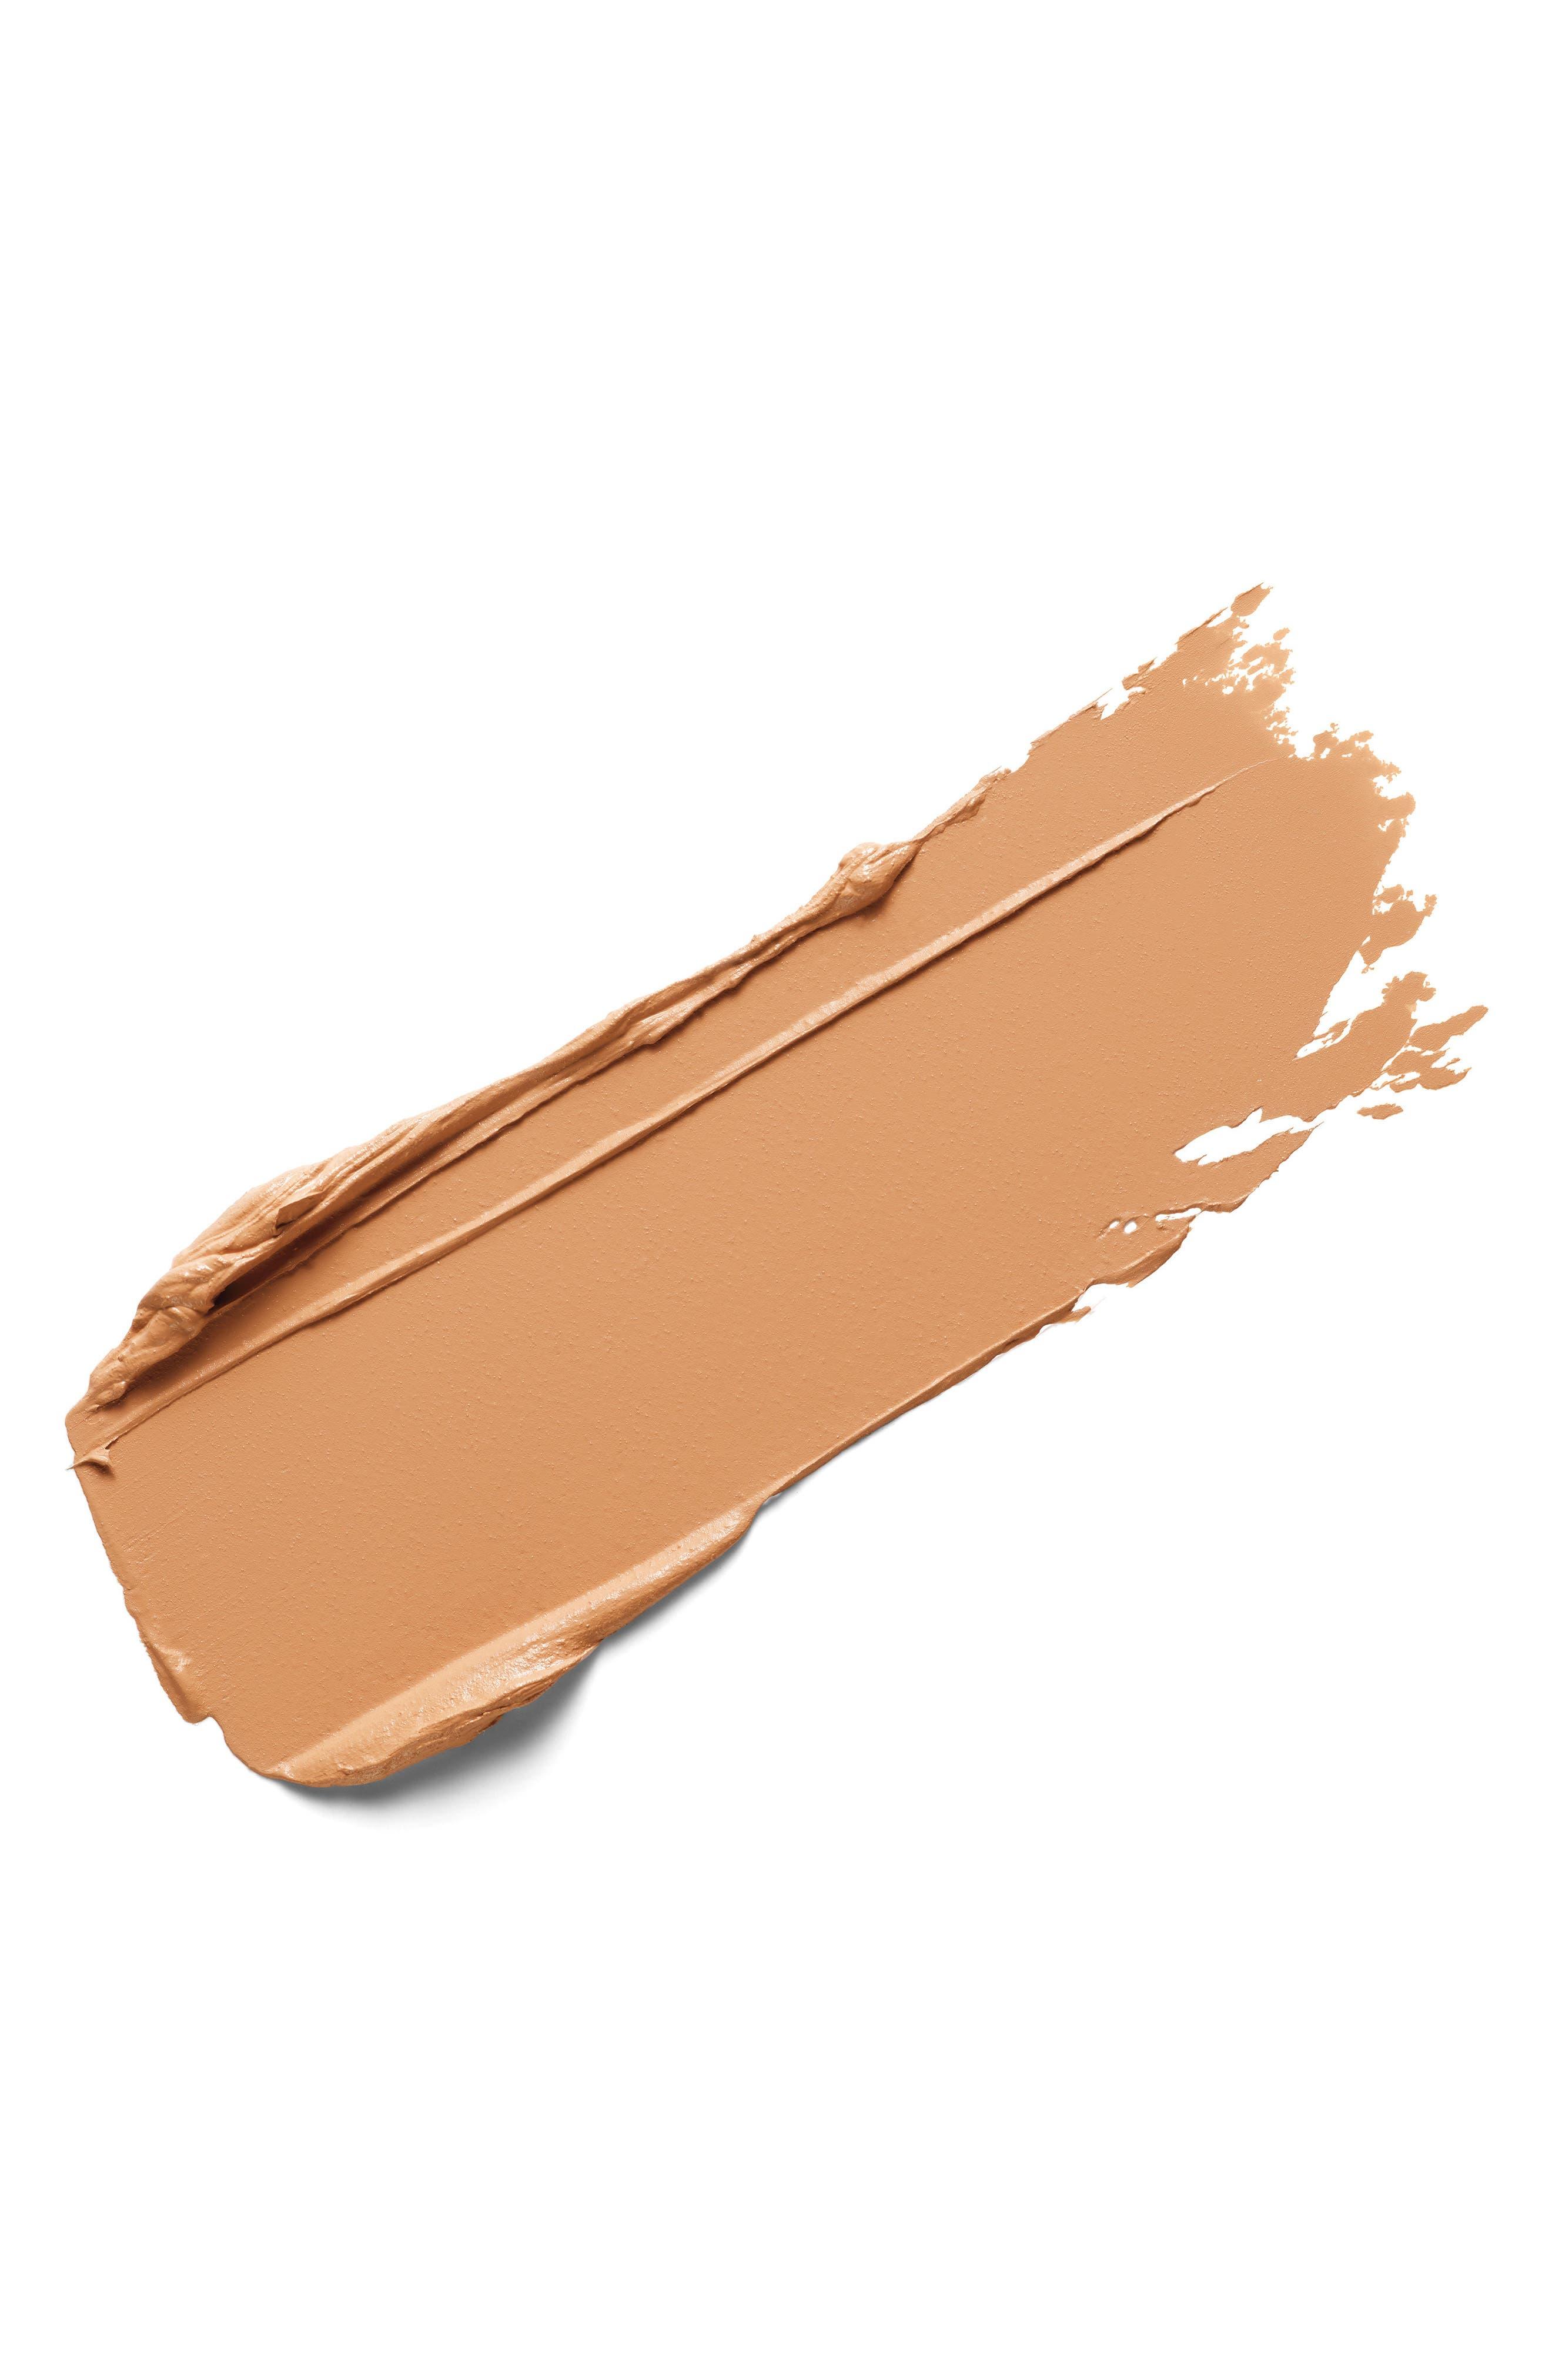 BarePro<sup>®</sup> Stick Concealer,                             Alternate thumbnail 3, color,                             09 Tan-Warm